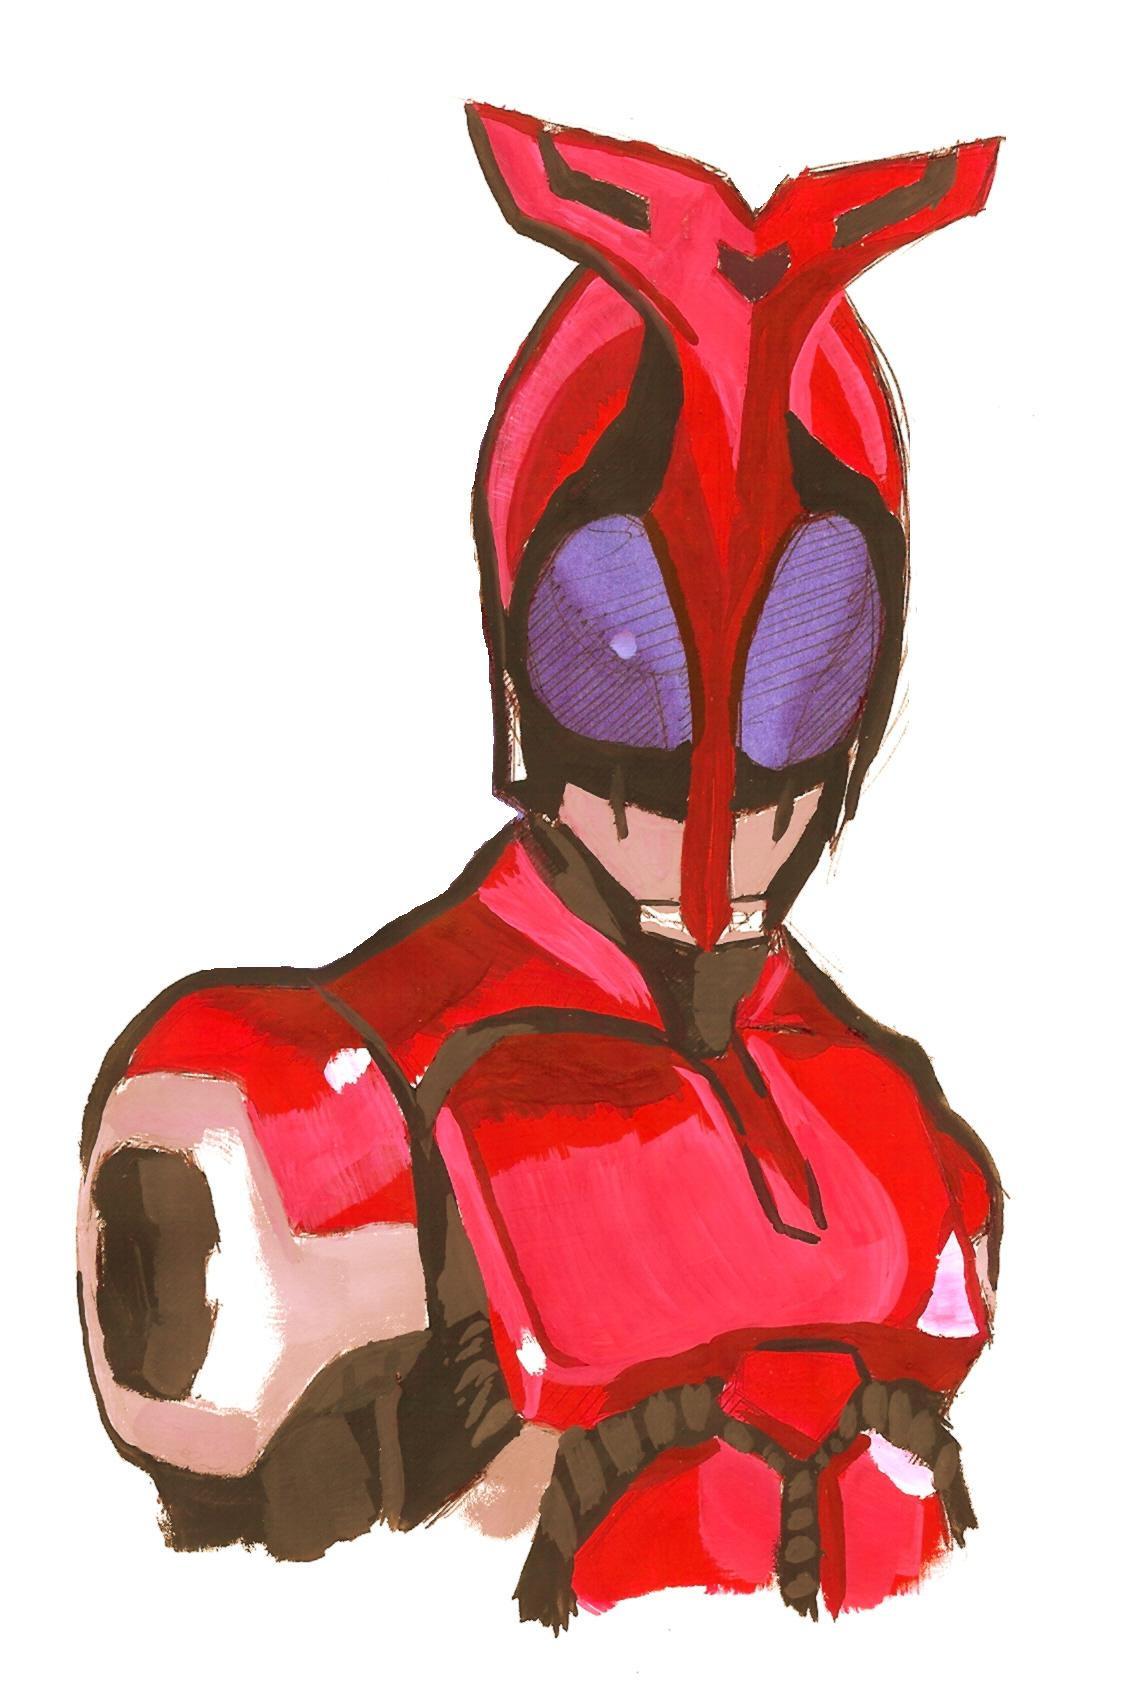 Kamen Rider Kabuto by orochi1356 on DeviantArt